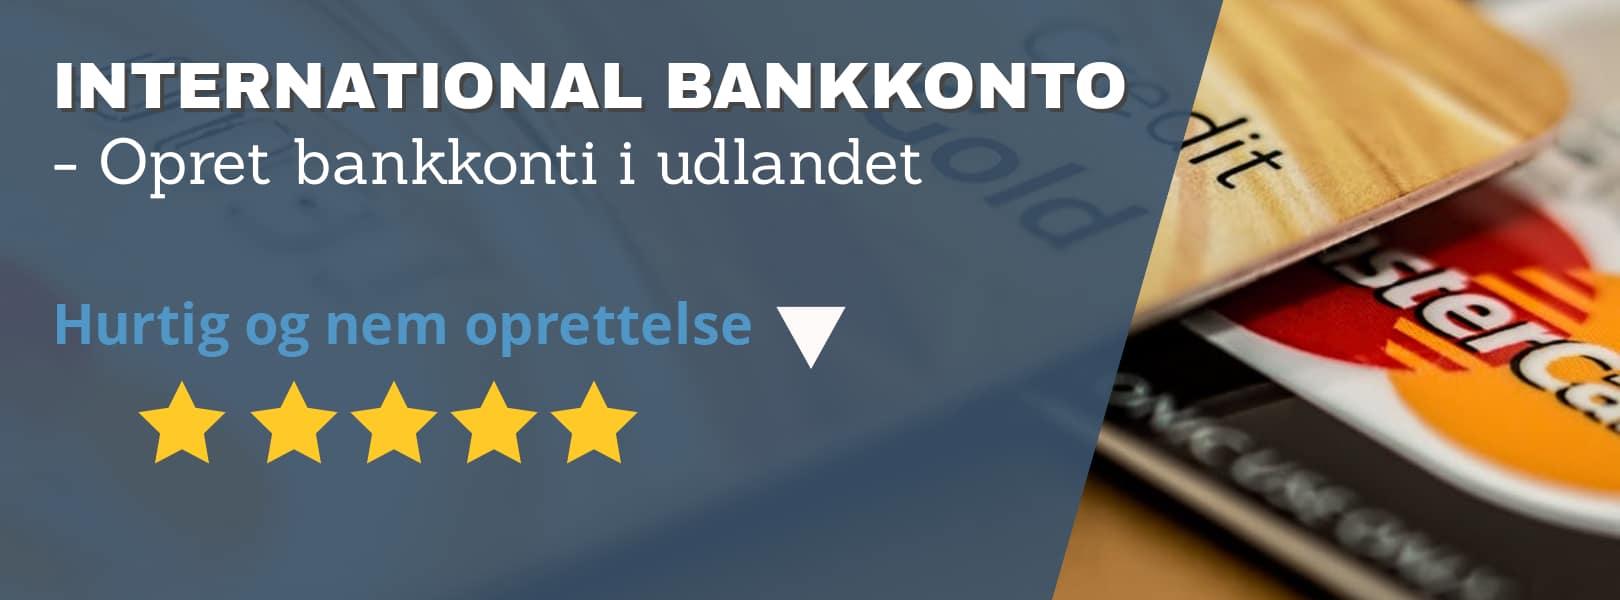 international bankkonto